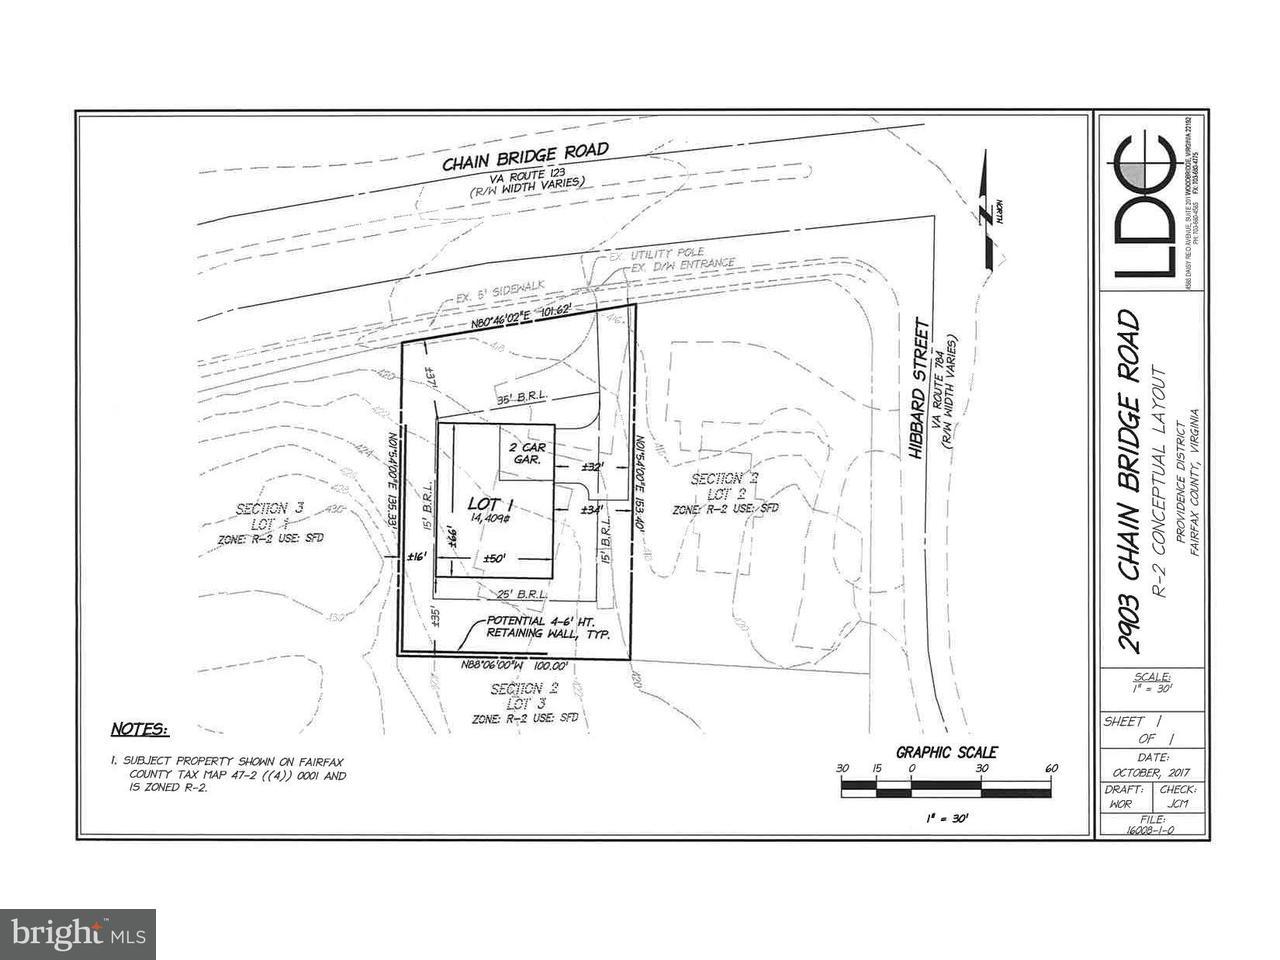 Single Family Home for Sale at 2903 Chain Bridge Road 2903 Chain Bridge Road Oakton, Virginia 22124 United States